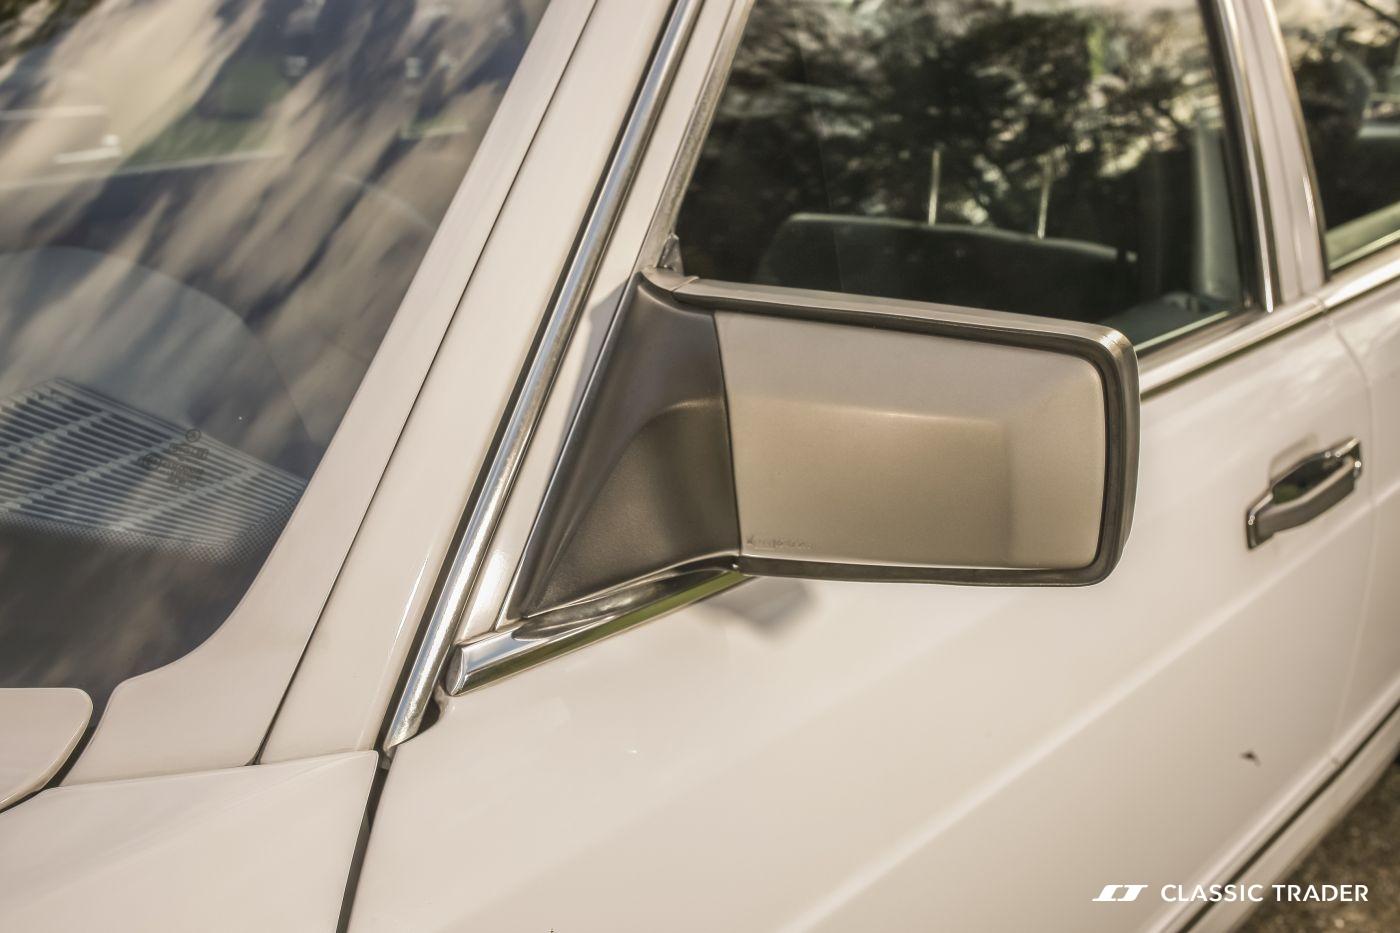 Mercedes-Benz W 126 S Klasse 300 SE (21)